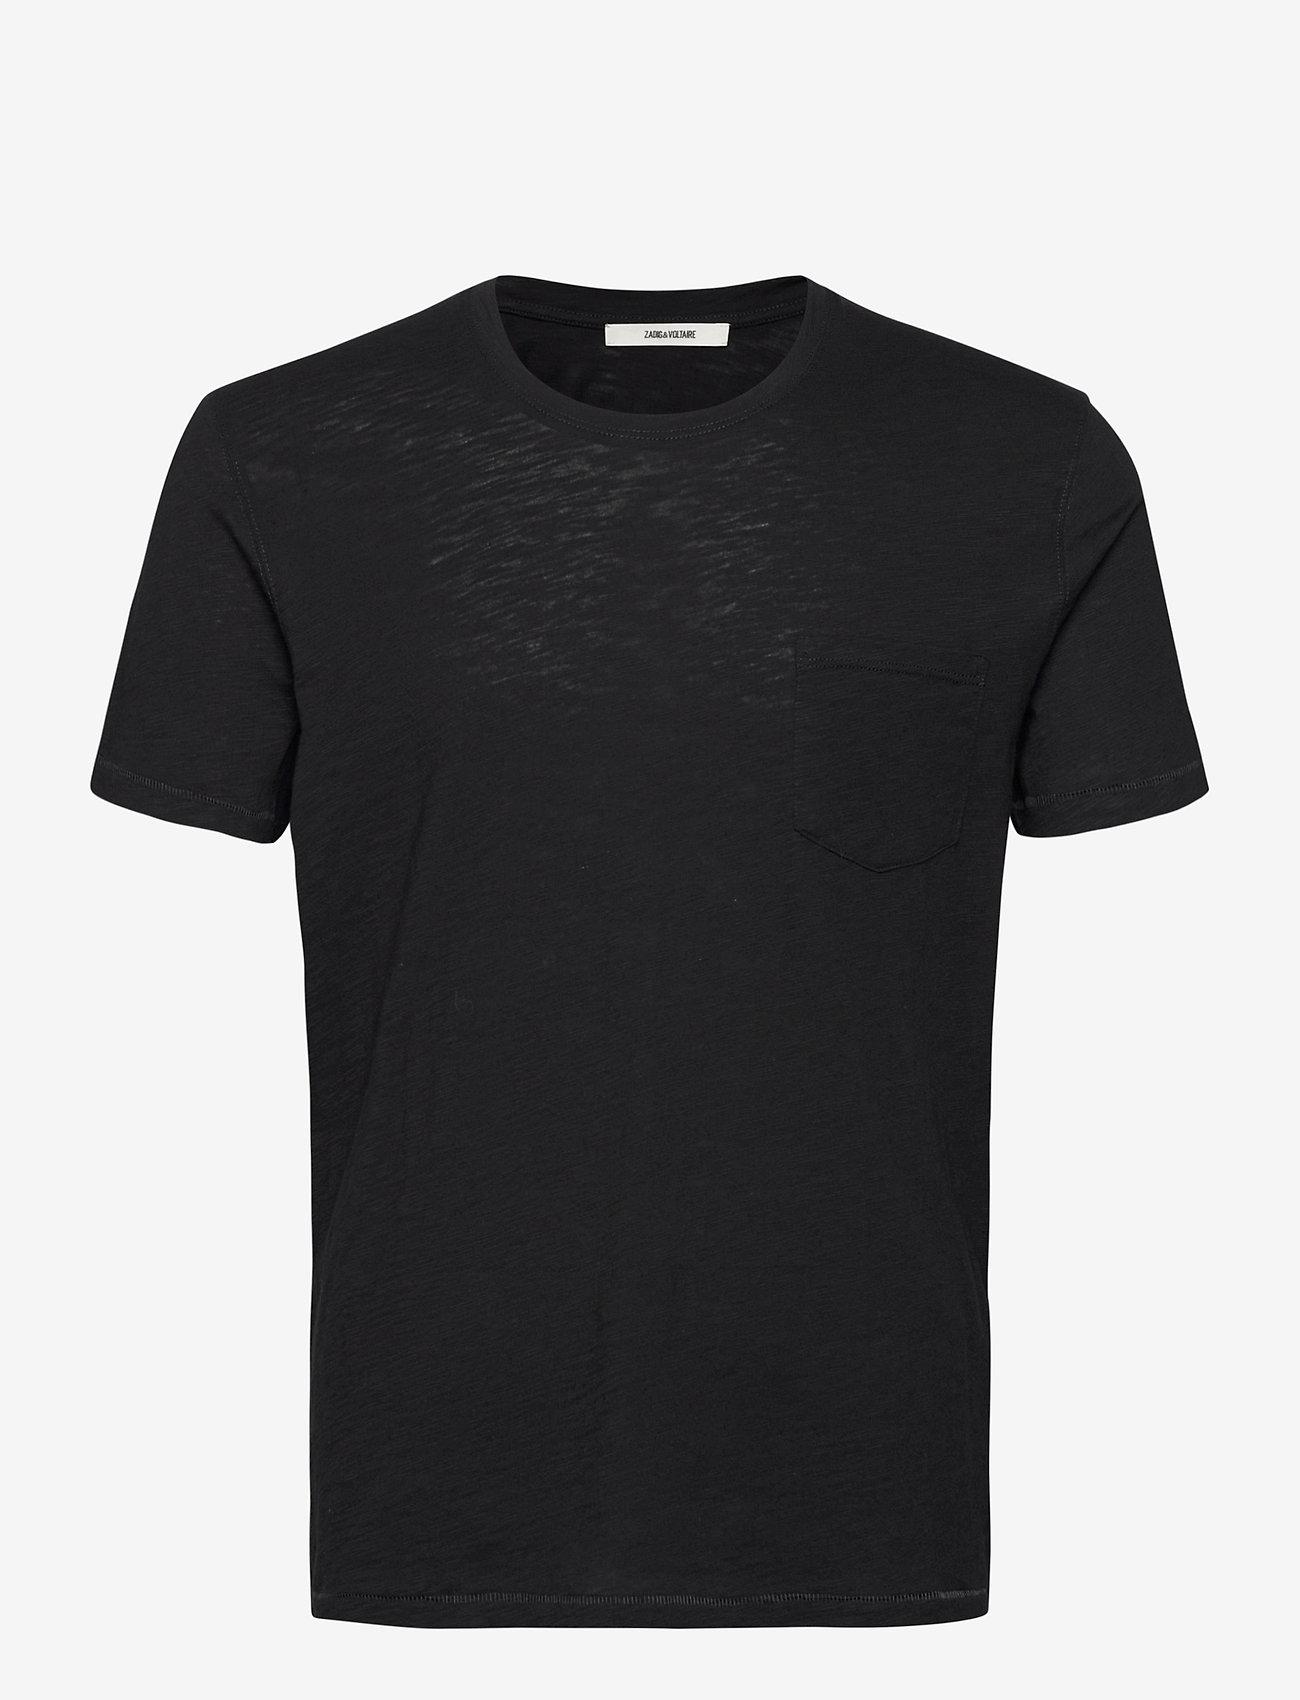 Zadig & Voltaire - STOCKHOLM FLAMME EAGLE SKULL TSHIRT MC PRINT DOS - basic t-shirts - black - 0